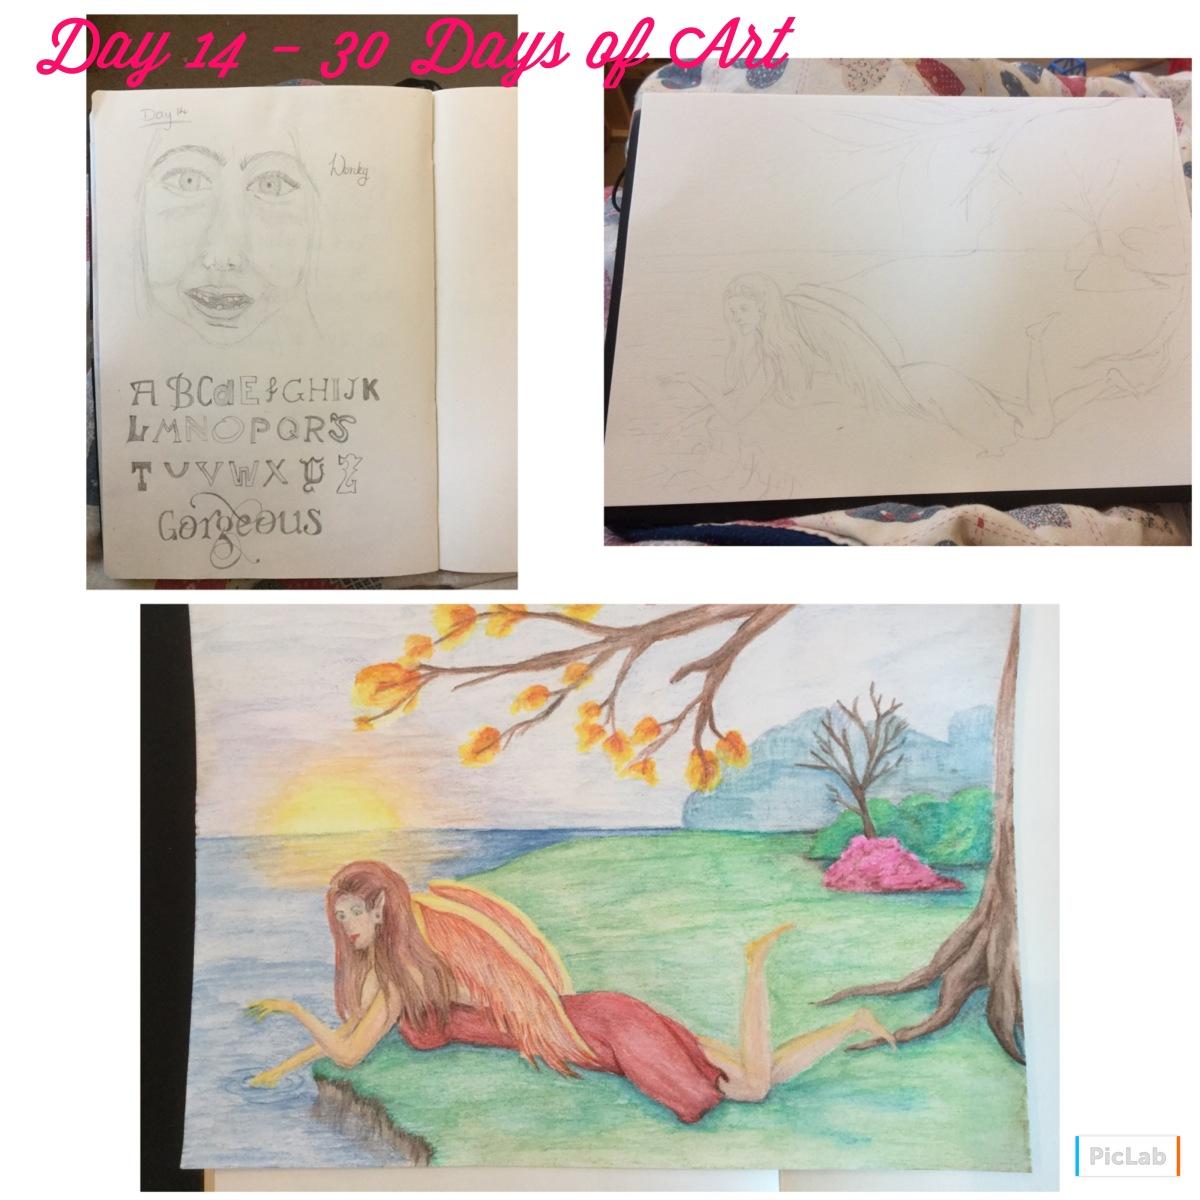 Day 14 – 30 Days of Art